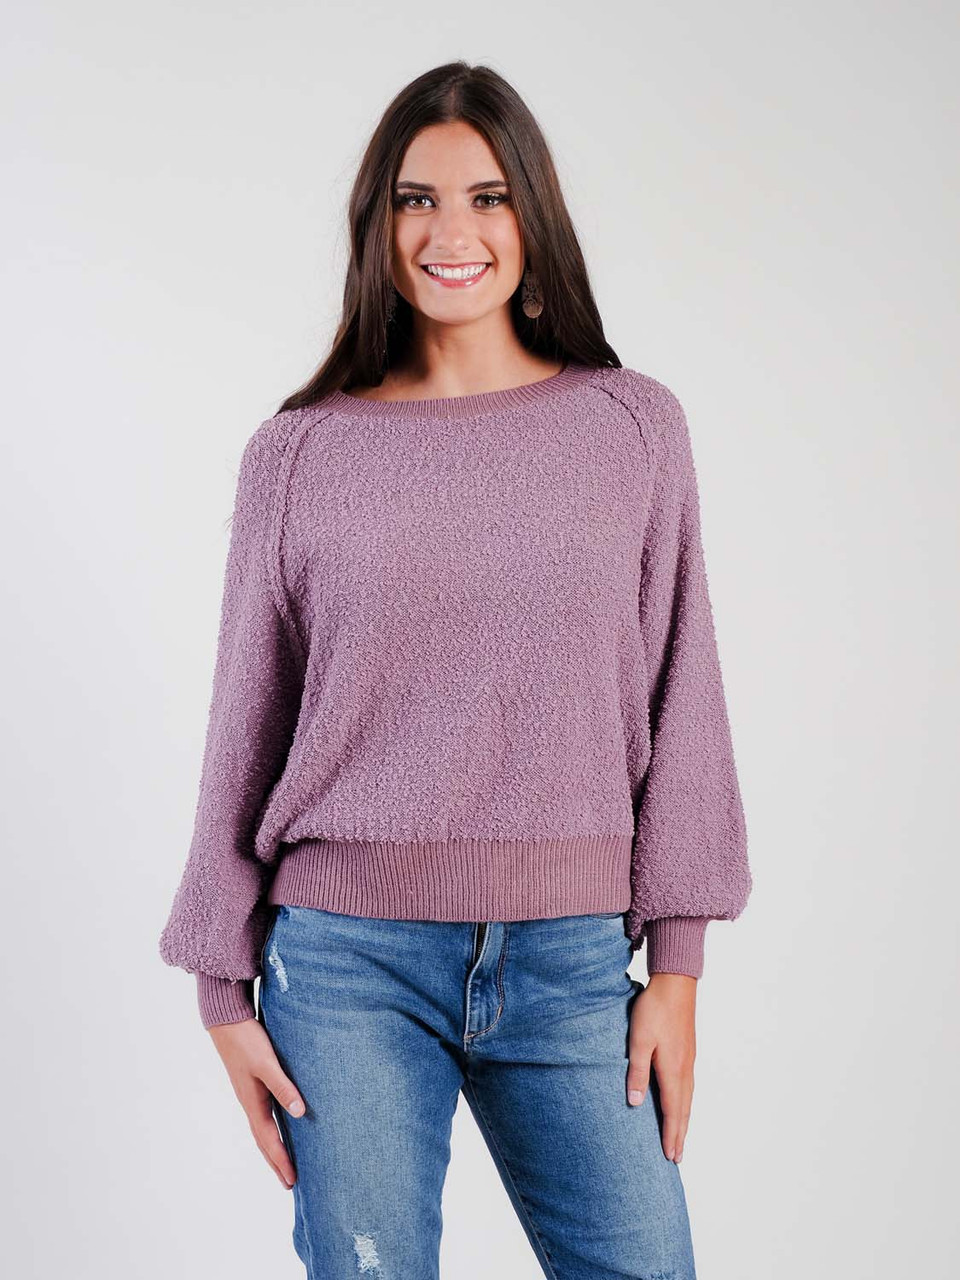 Umgee mauve sweatshirt material